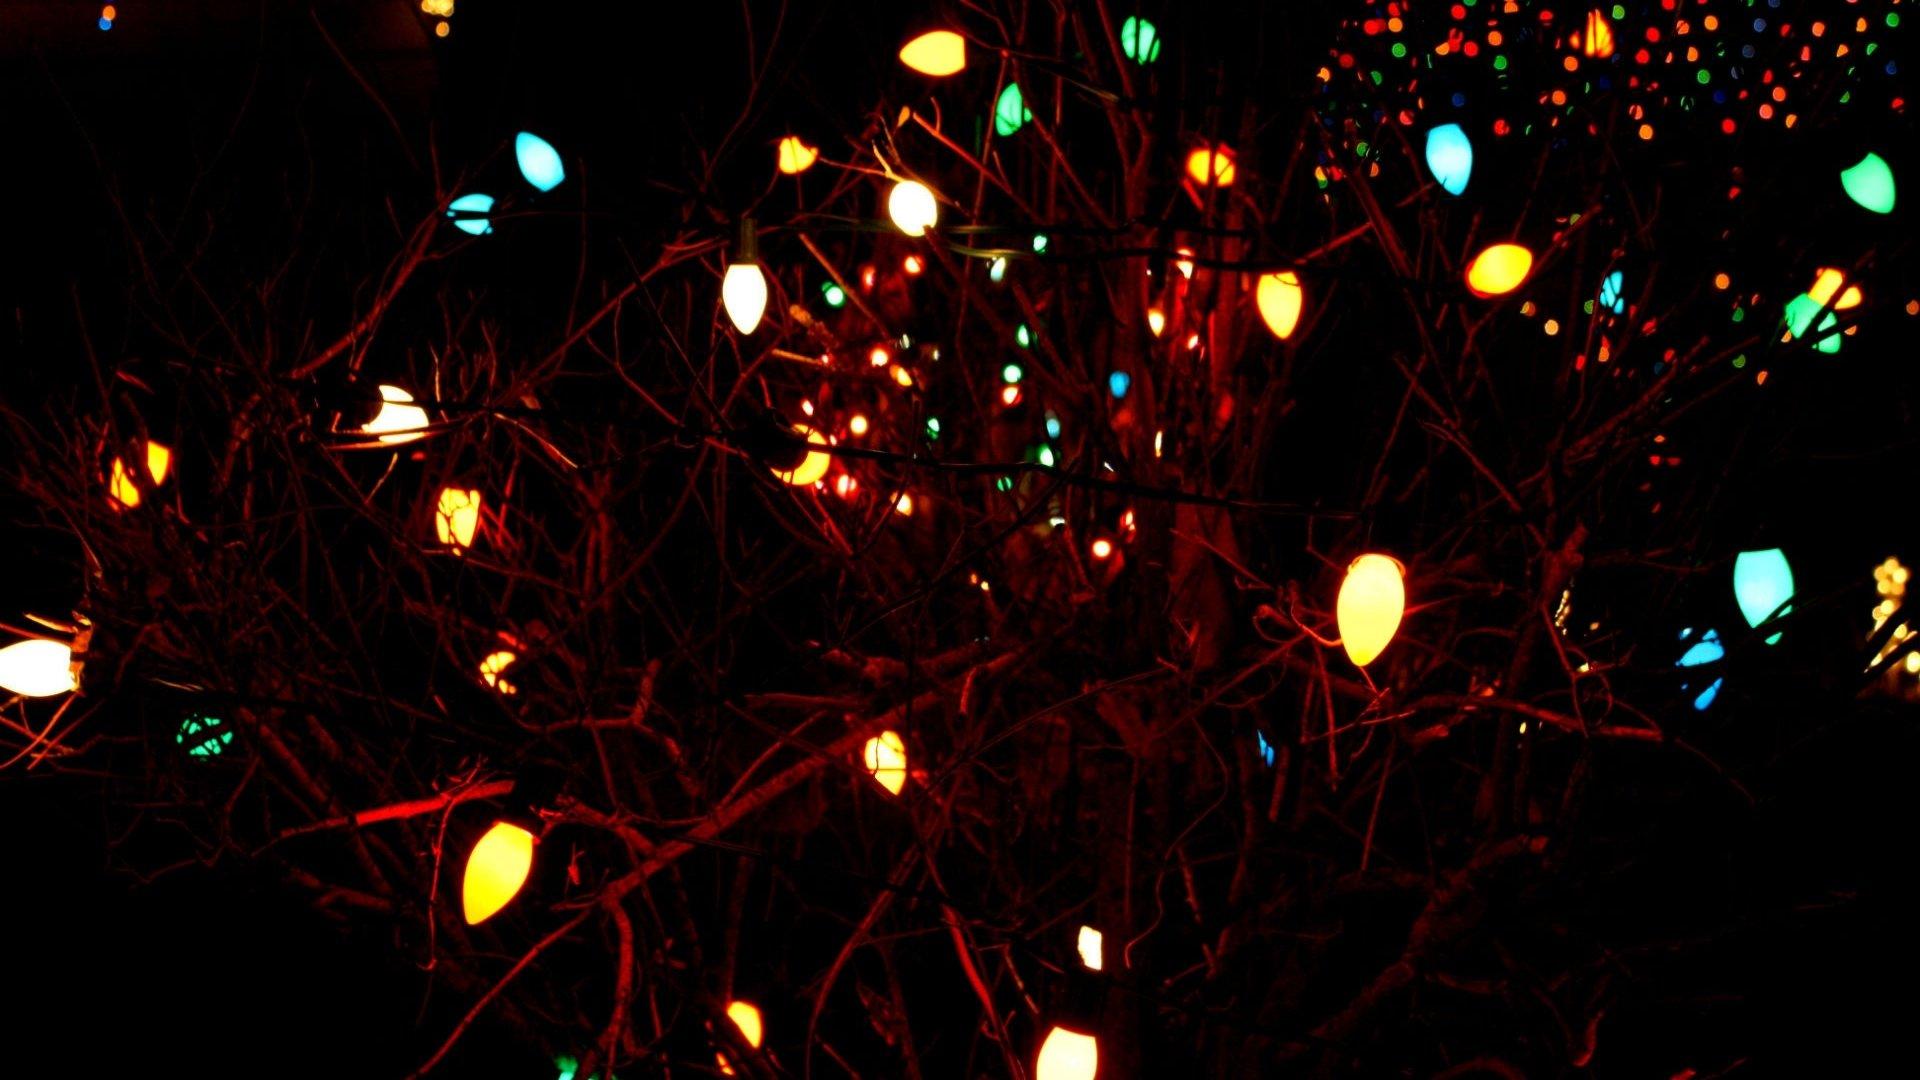 Aesthetic Christmas Background Free